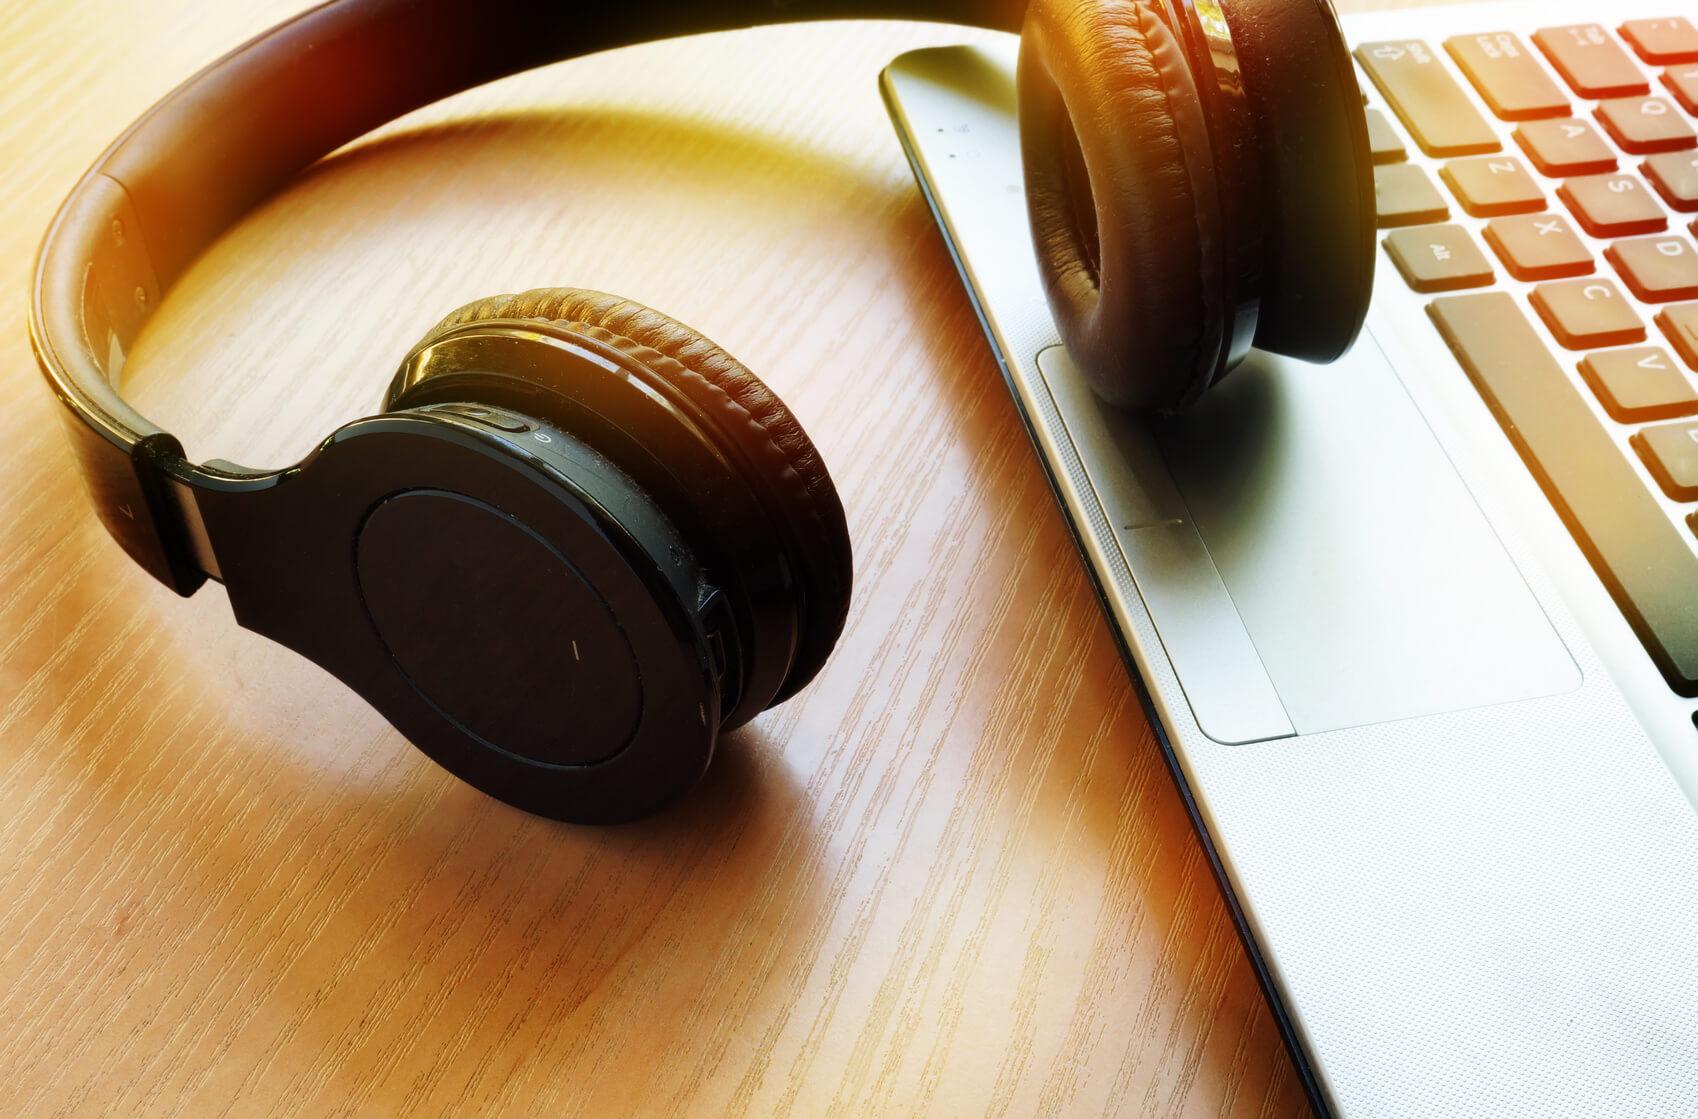 Kopfhörer auf Laptop